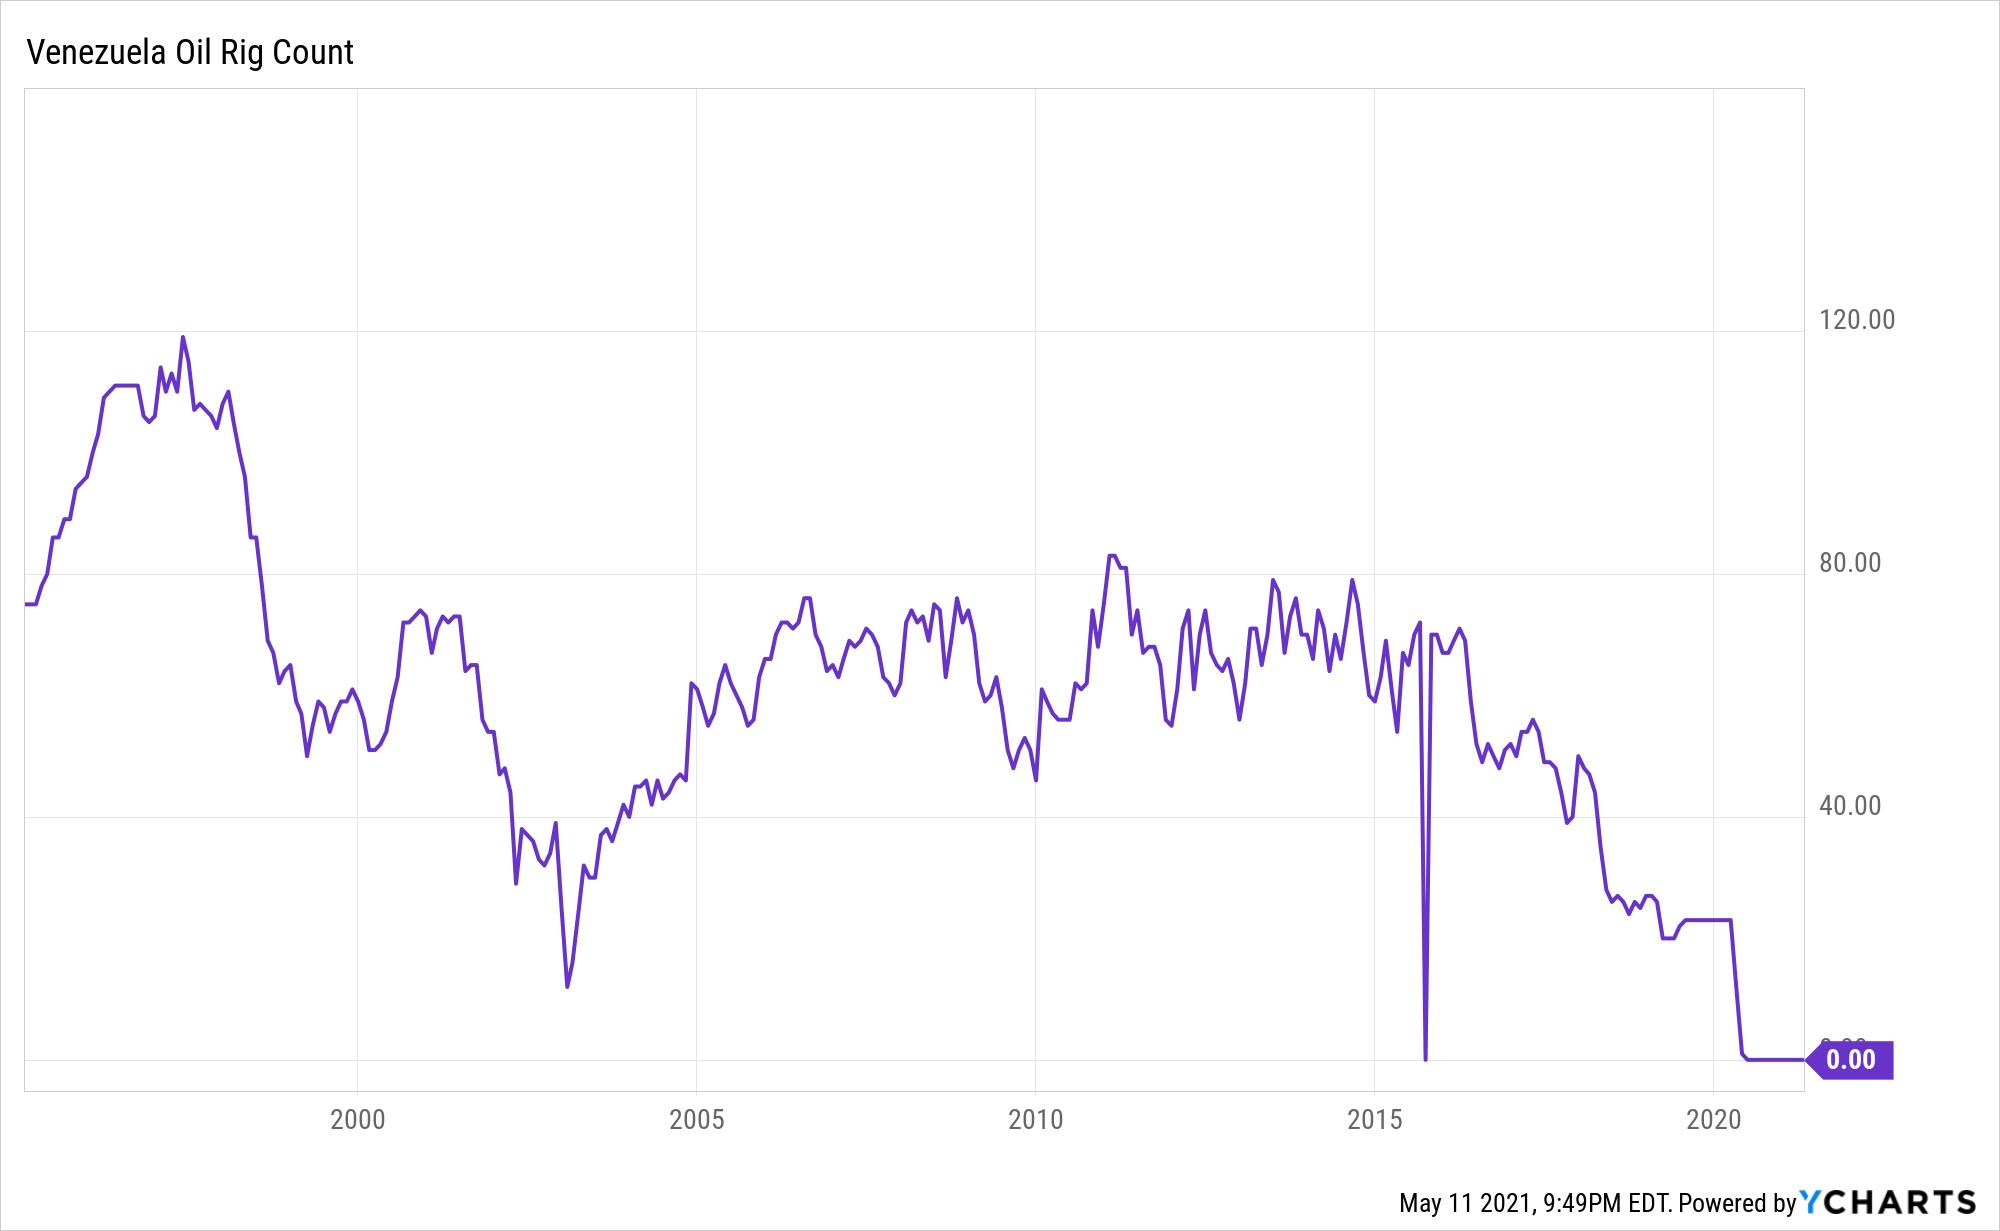 Venezuela Oil Rig Count Chart